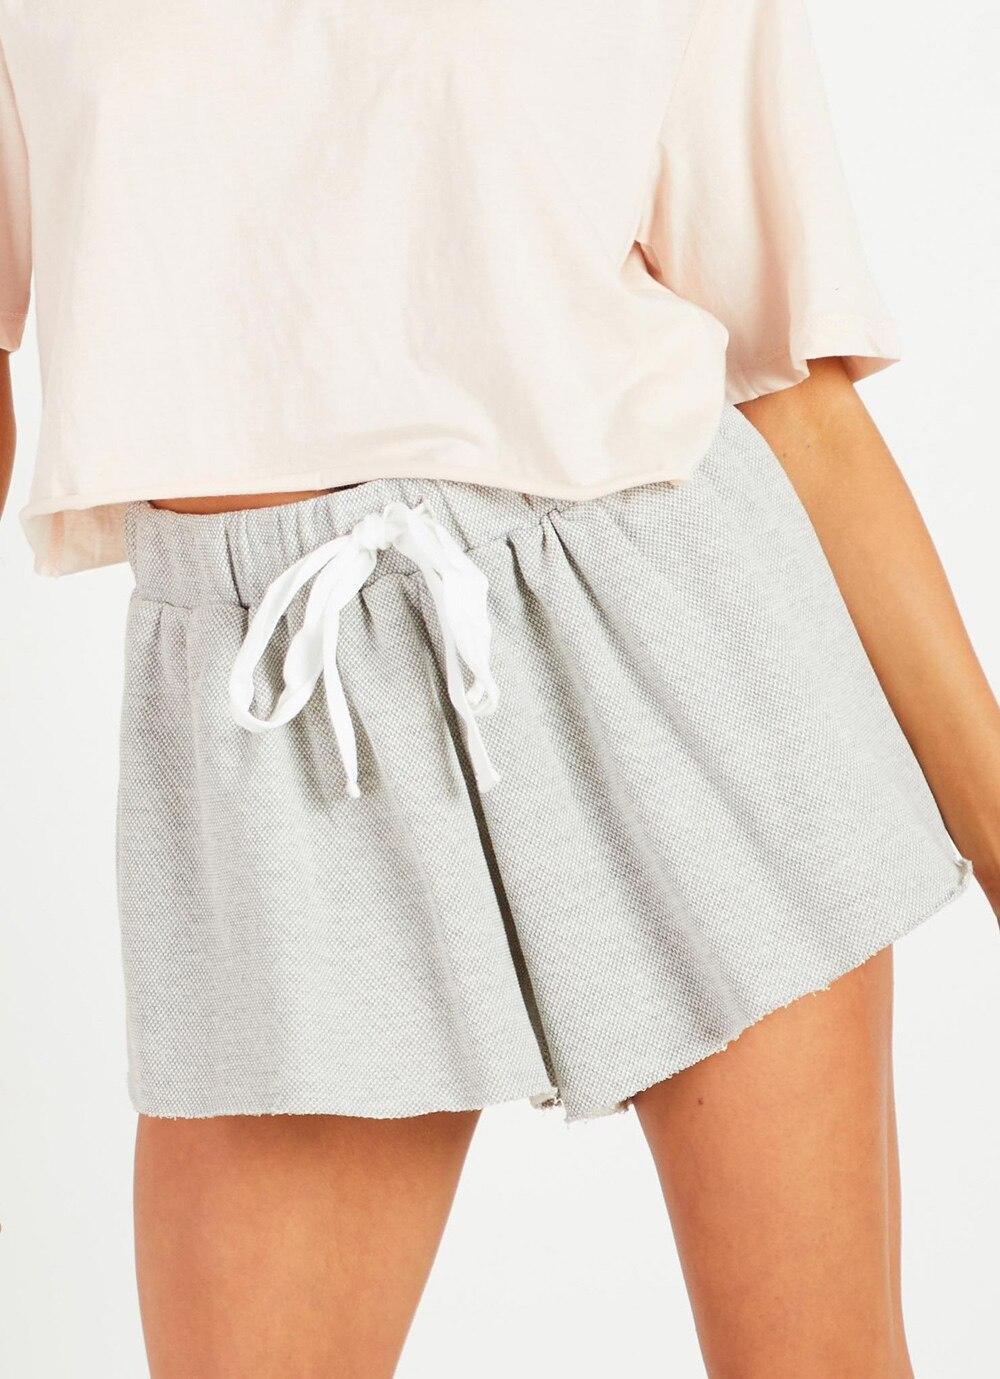 2019 Fashion Women Sexy Hot Pants Summer   Short   Pant Casual   Shorts   High Waist Loose   Short   Pants